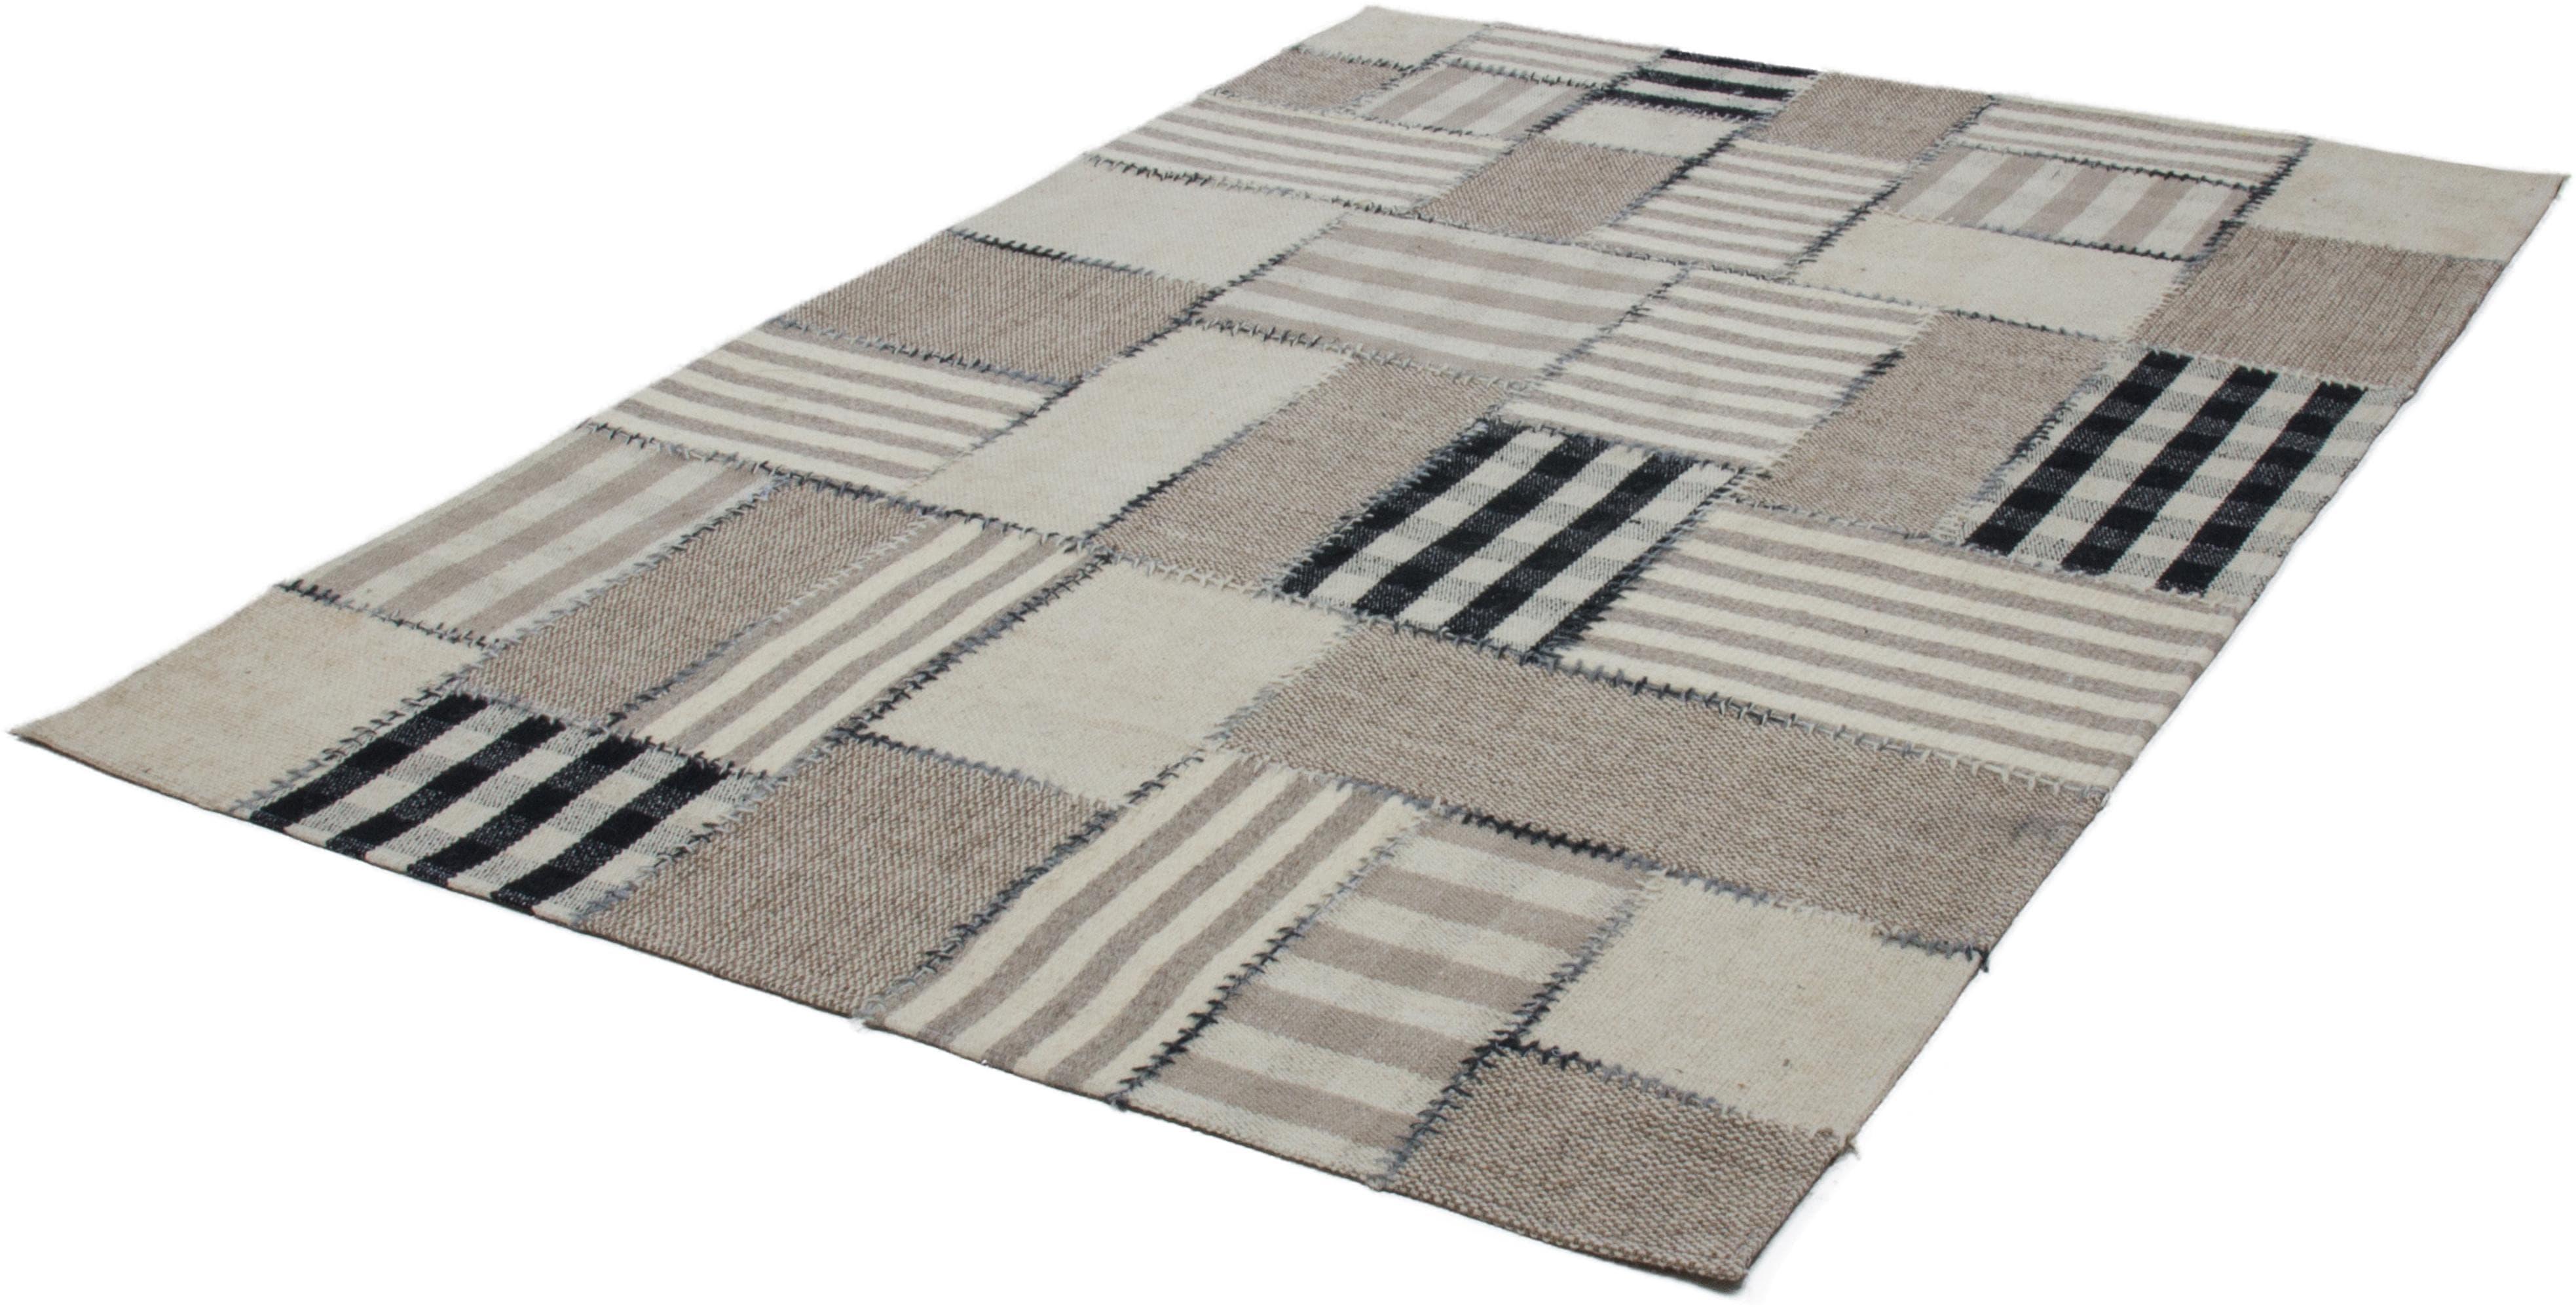 Teppich Liana 213 Kayoom rechteckig Höhe 6 mm handgewebt